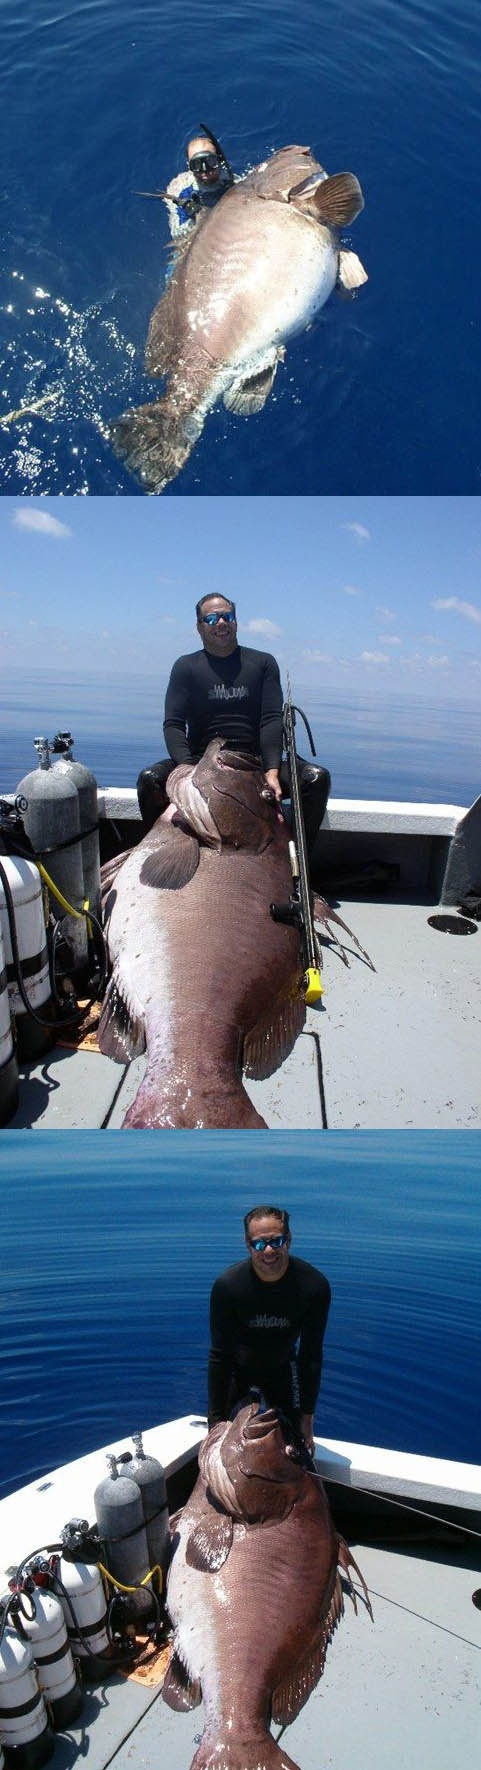 Best 25 spear fishing ideas on pinterest spearfishing for Free fishing stuff